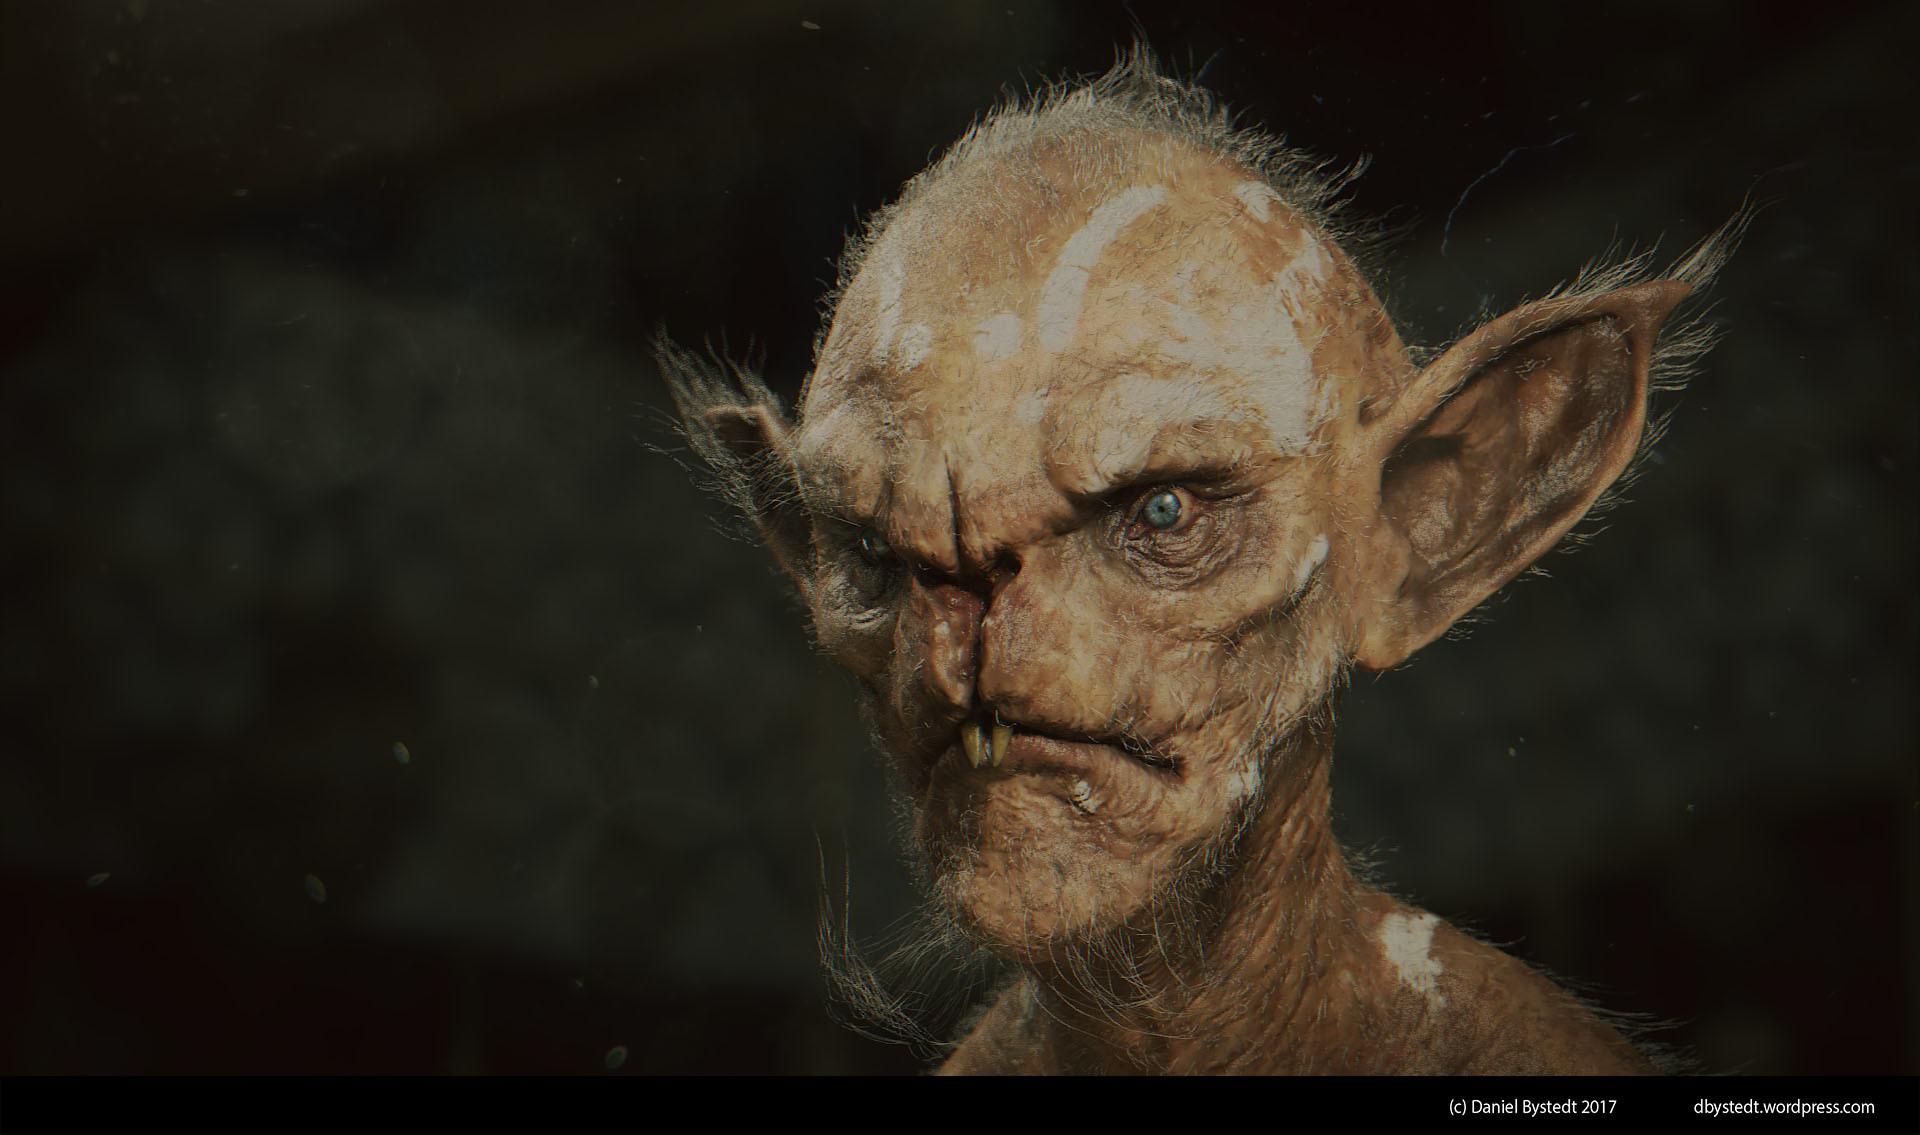 Daniel bystedt goblin 4